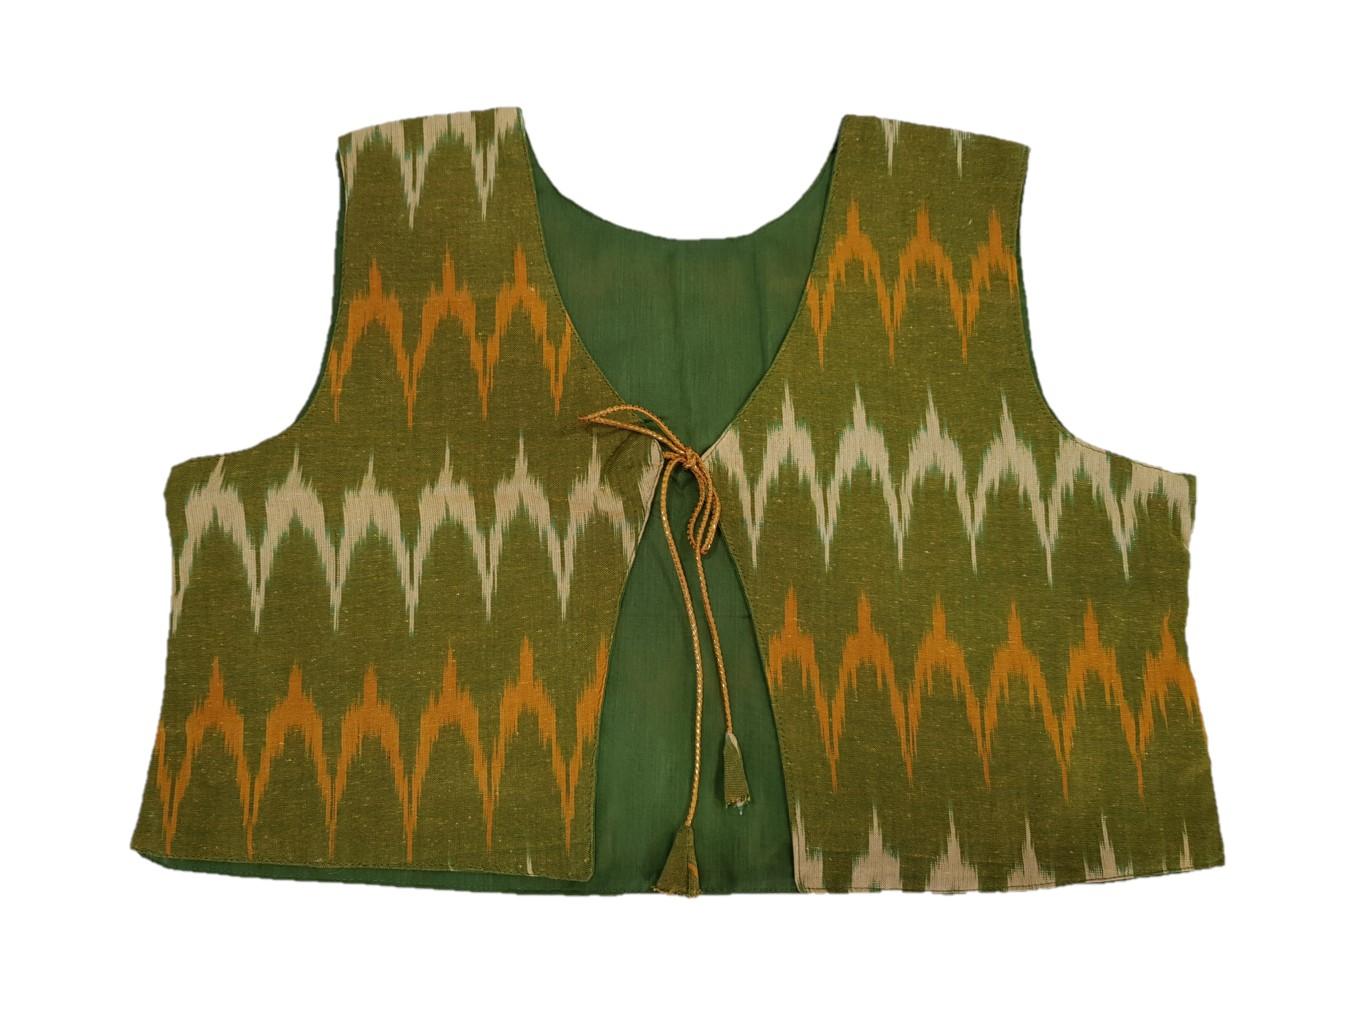 Pochampally Ikat Jacket Short Waist Coat with Front Knot OliveGreen Size Large : Picture